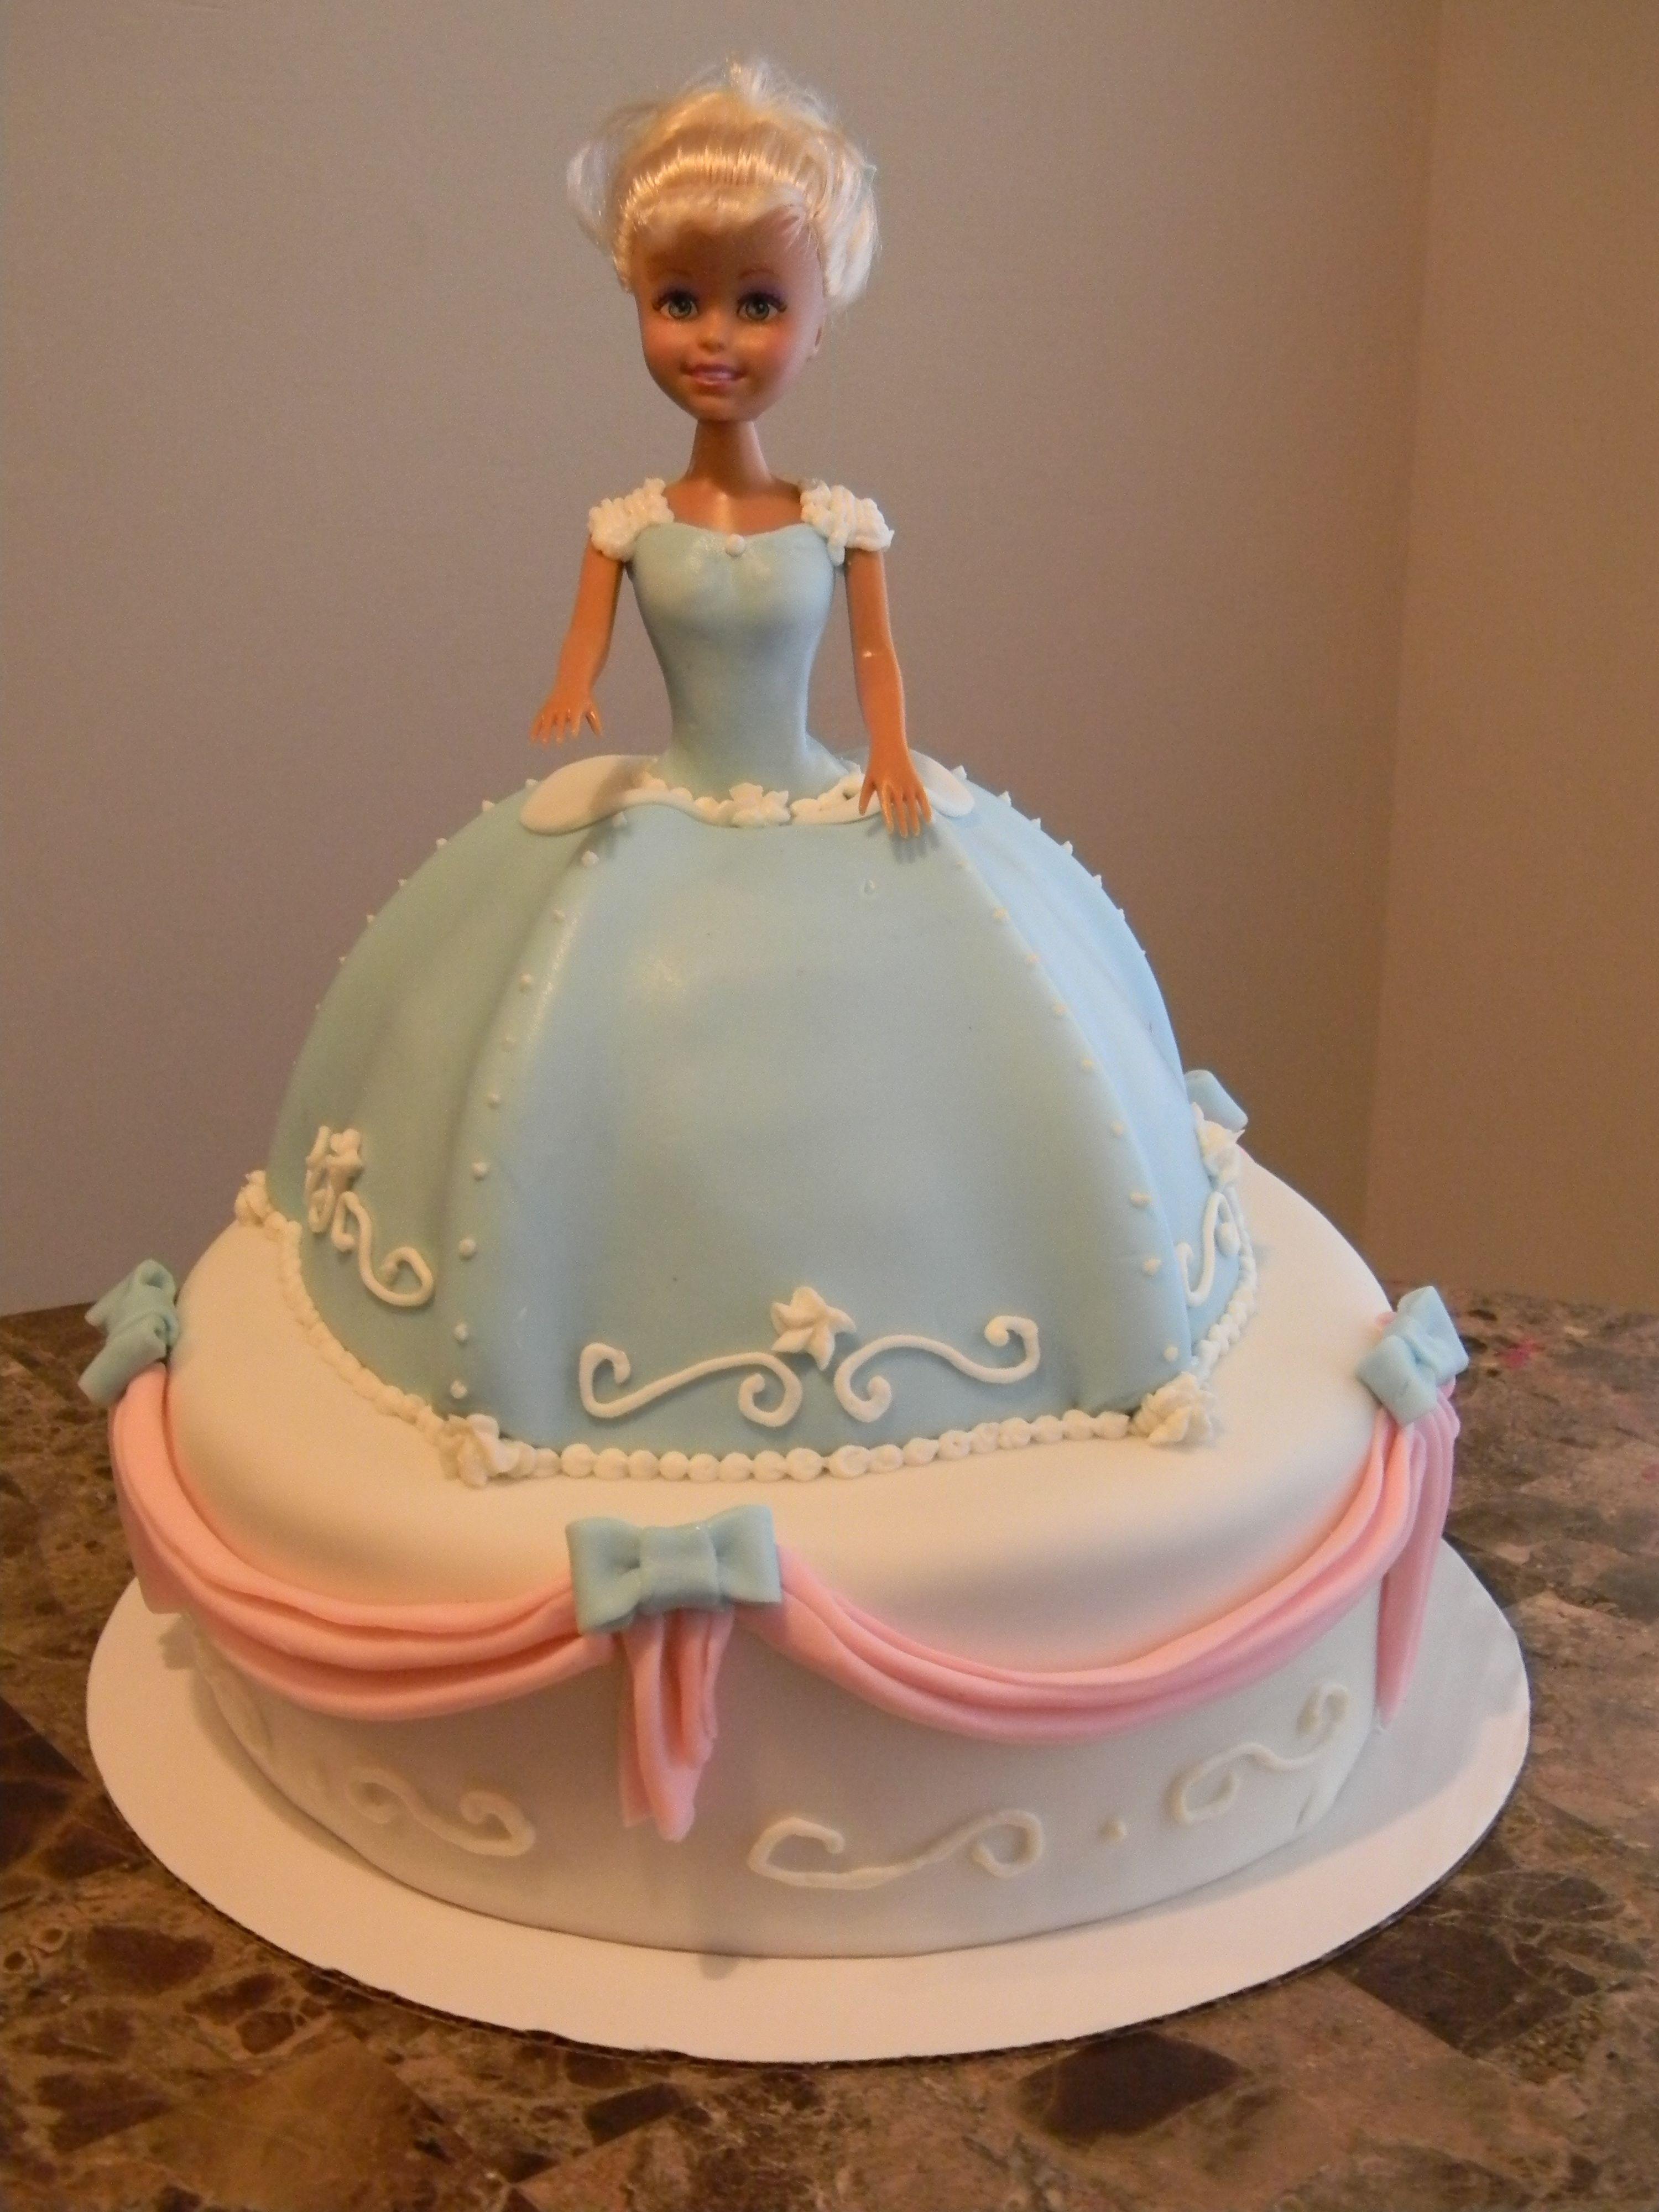 Pin Charles And Princess Diana Wedding Cake Day Cake on